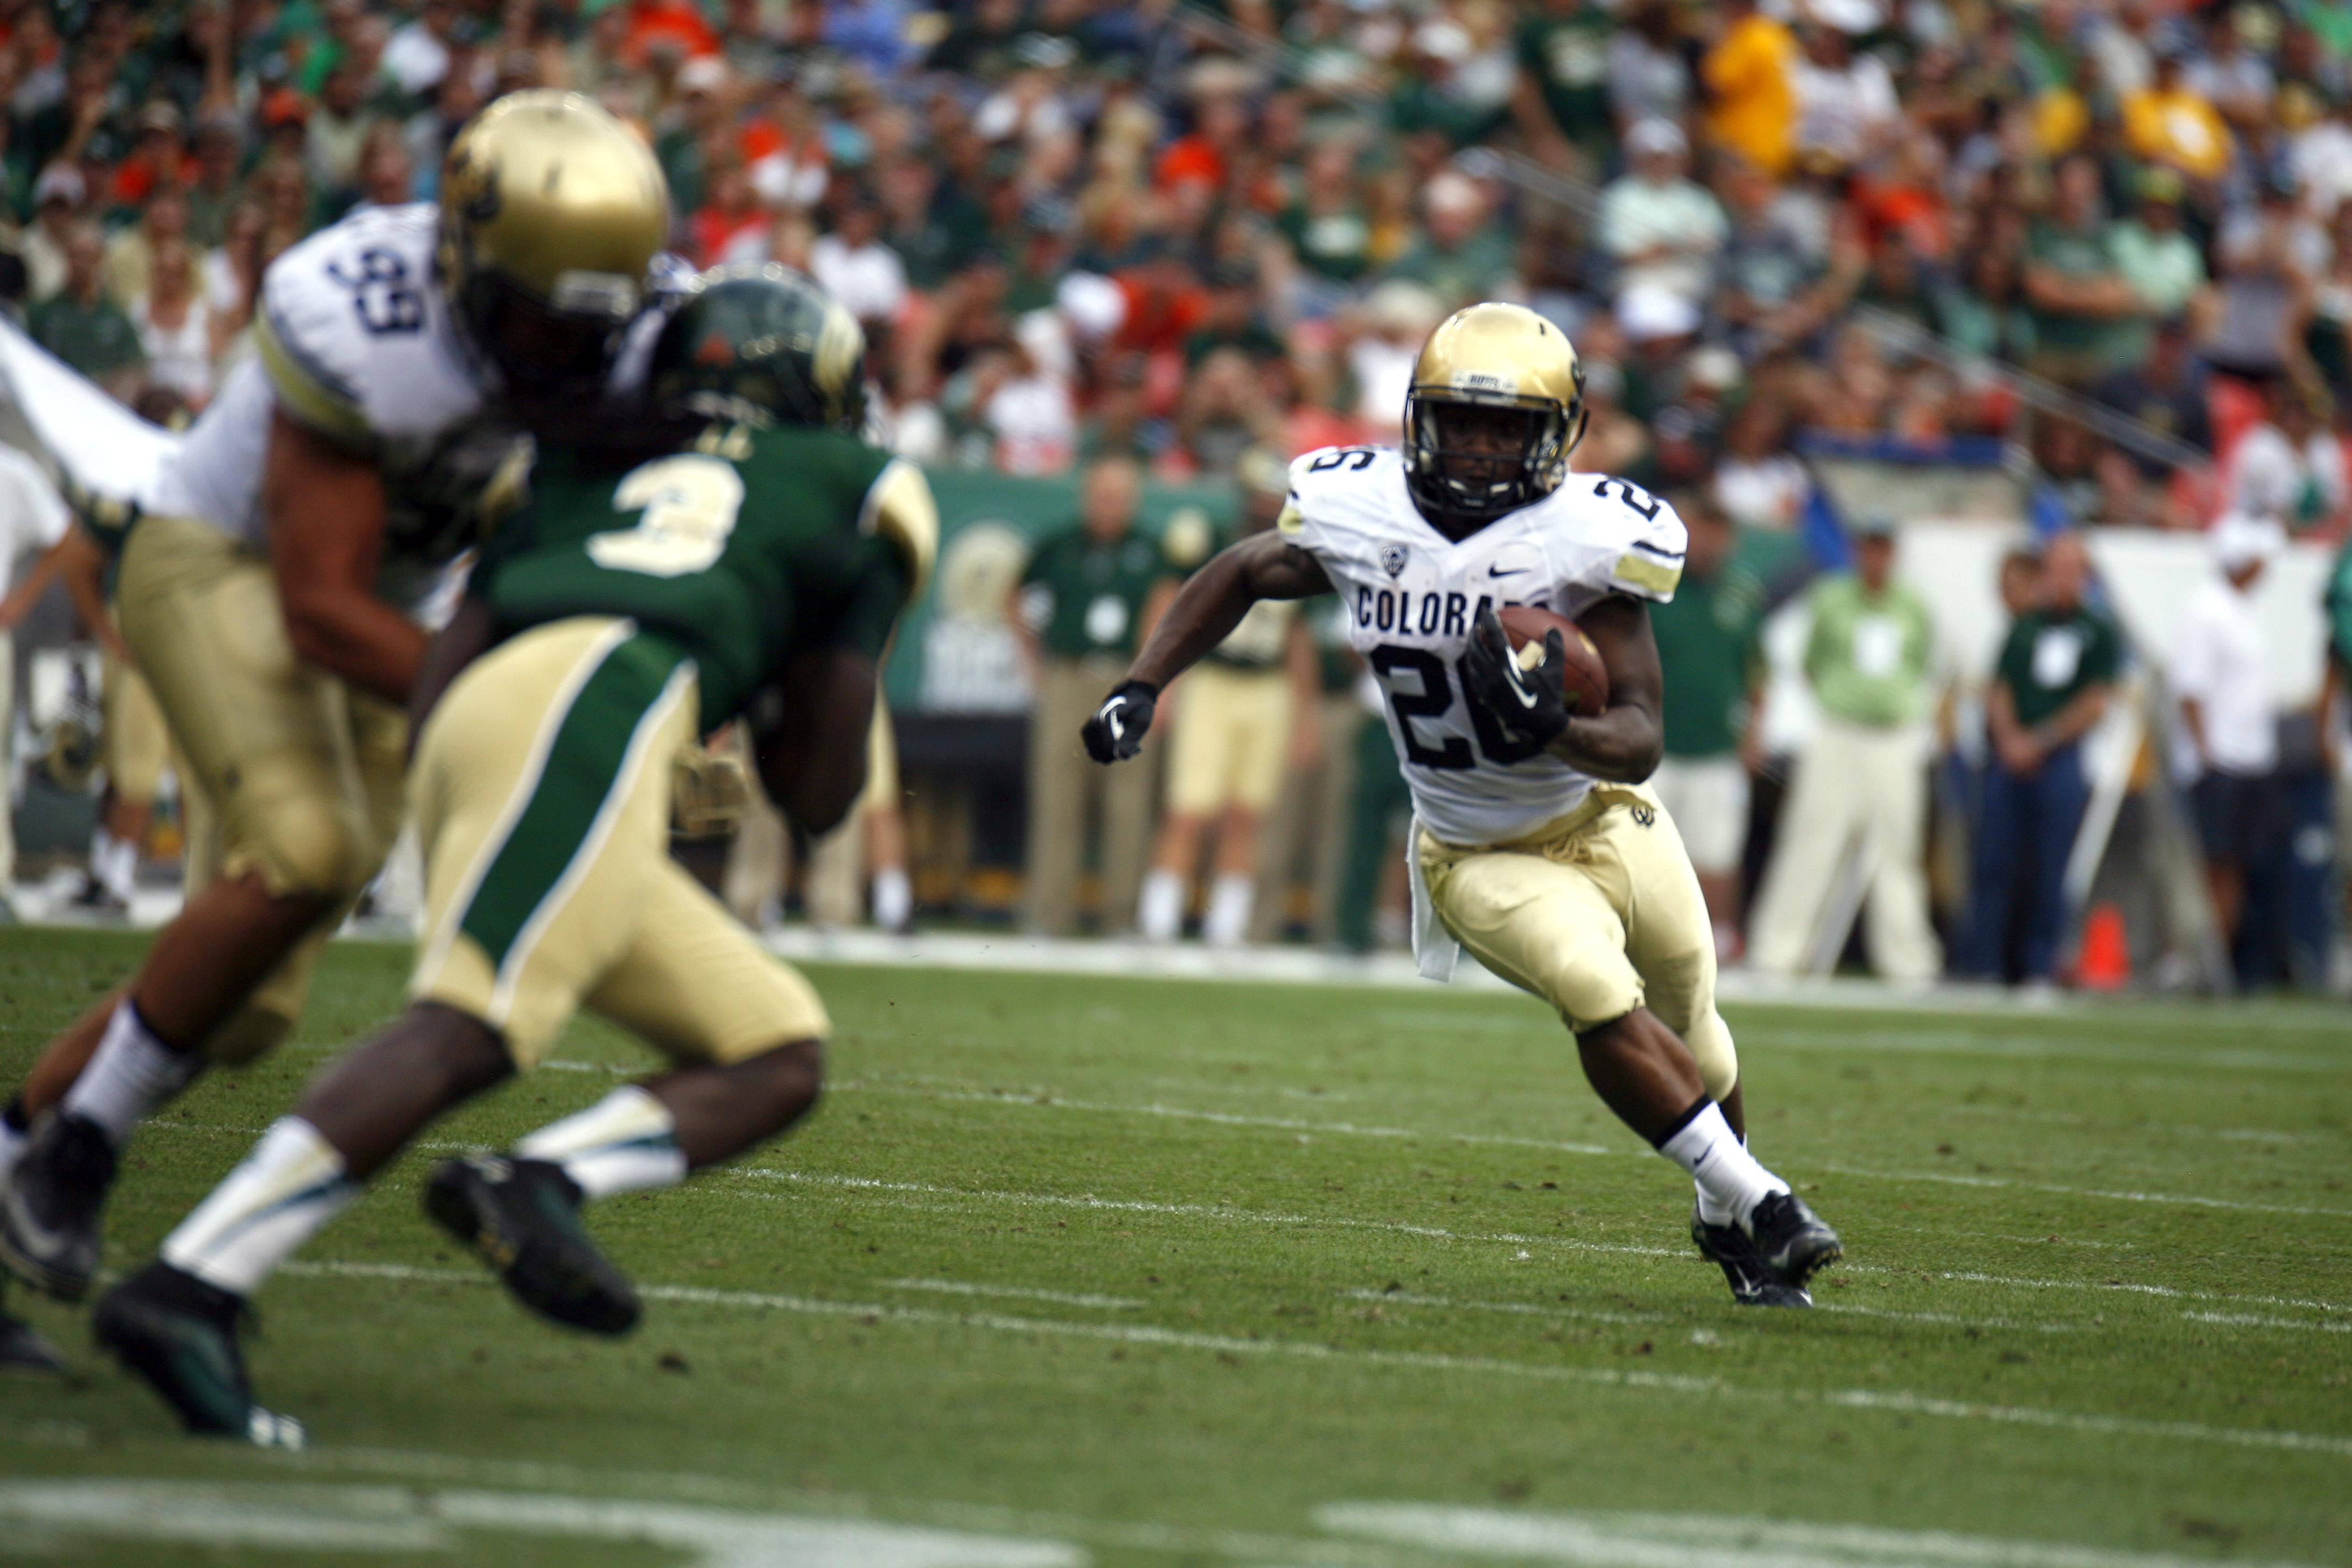 Football heads to Arizona State this weekend